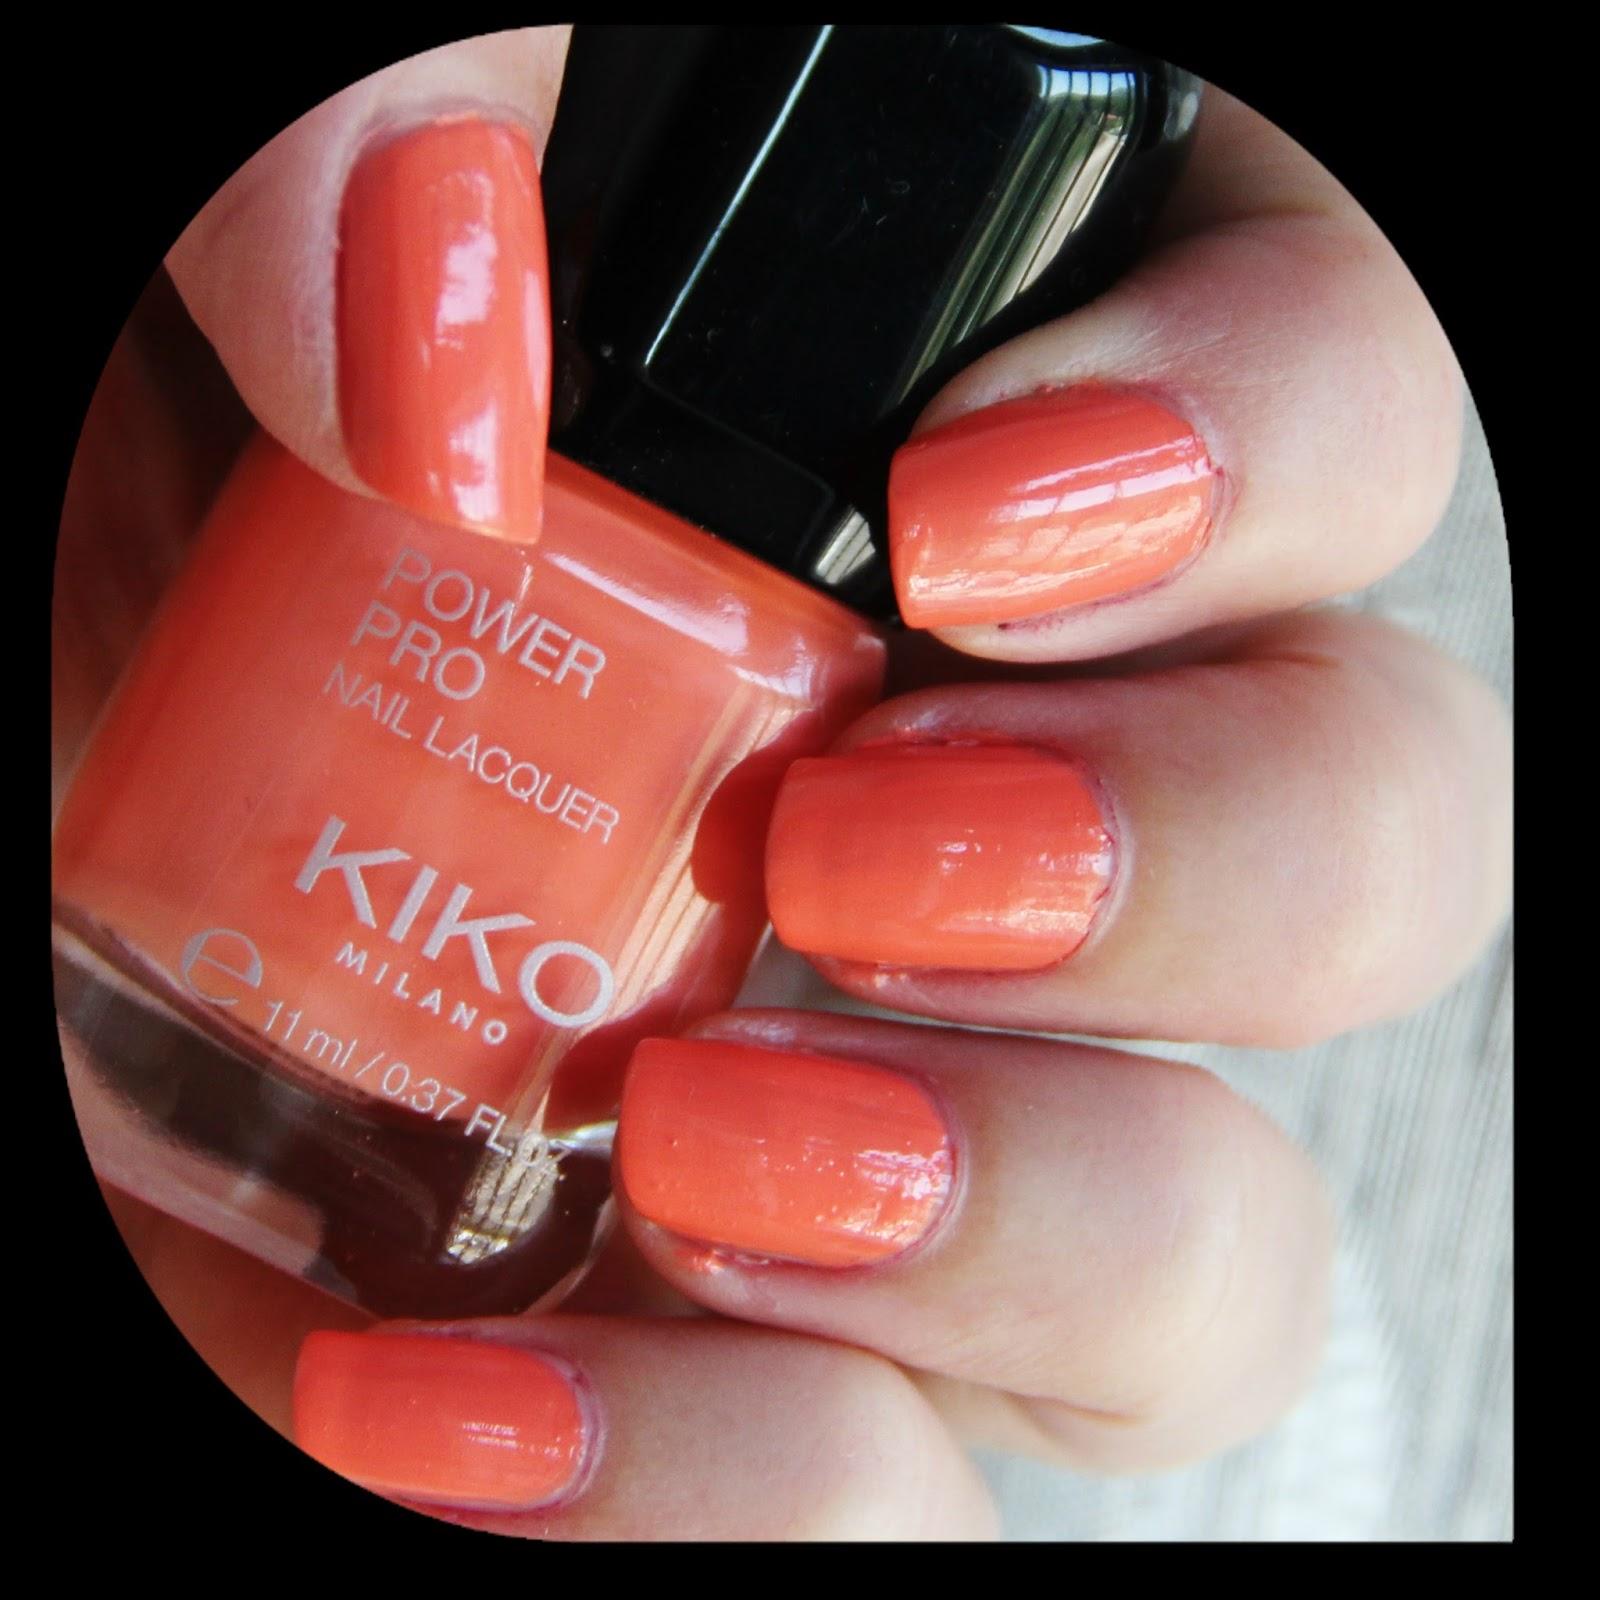 Notd Kiko Pro Nail Lacquer 07 Pesca